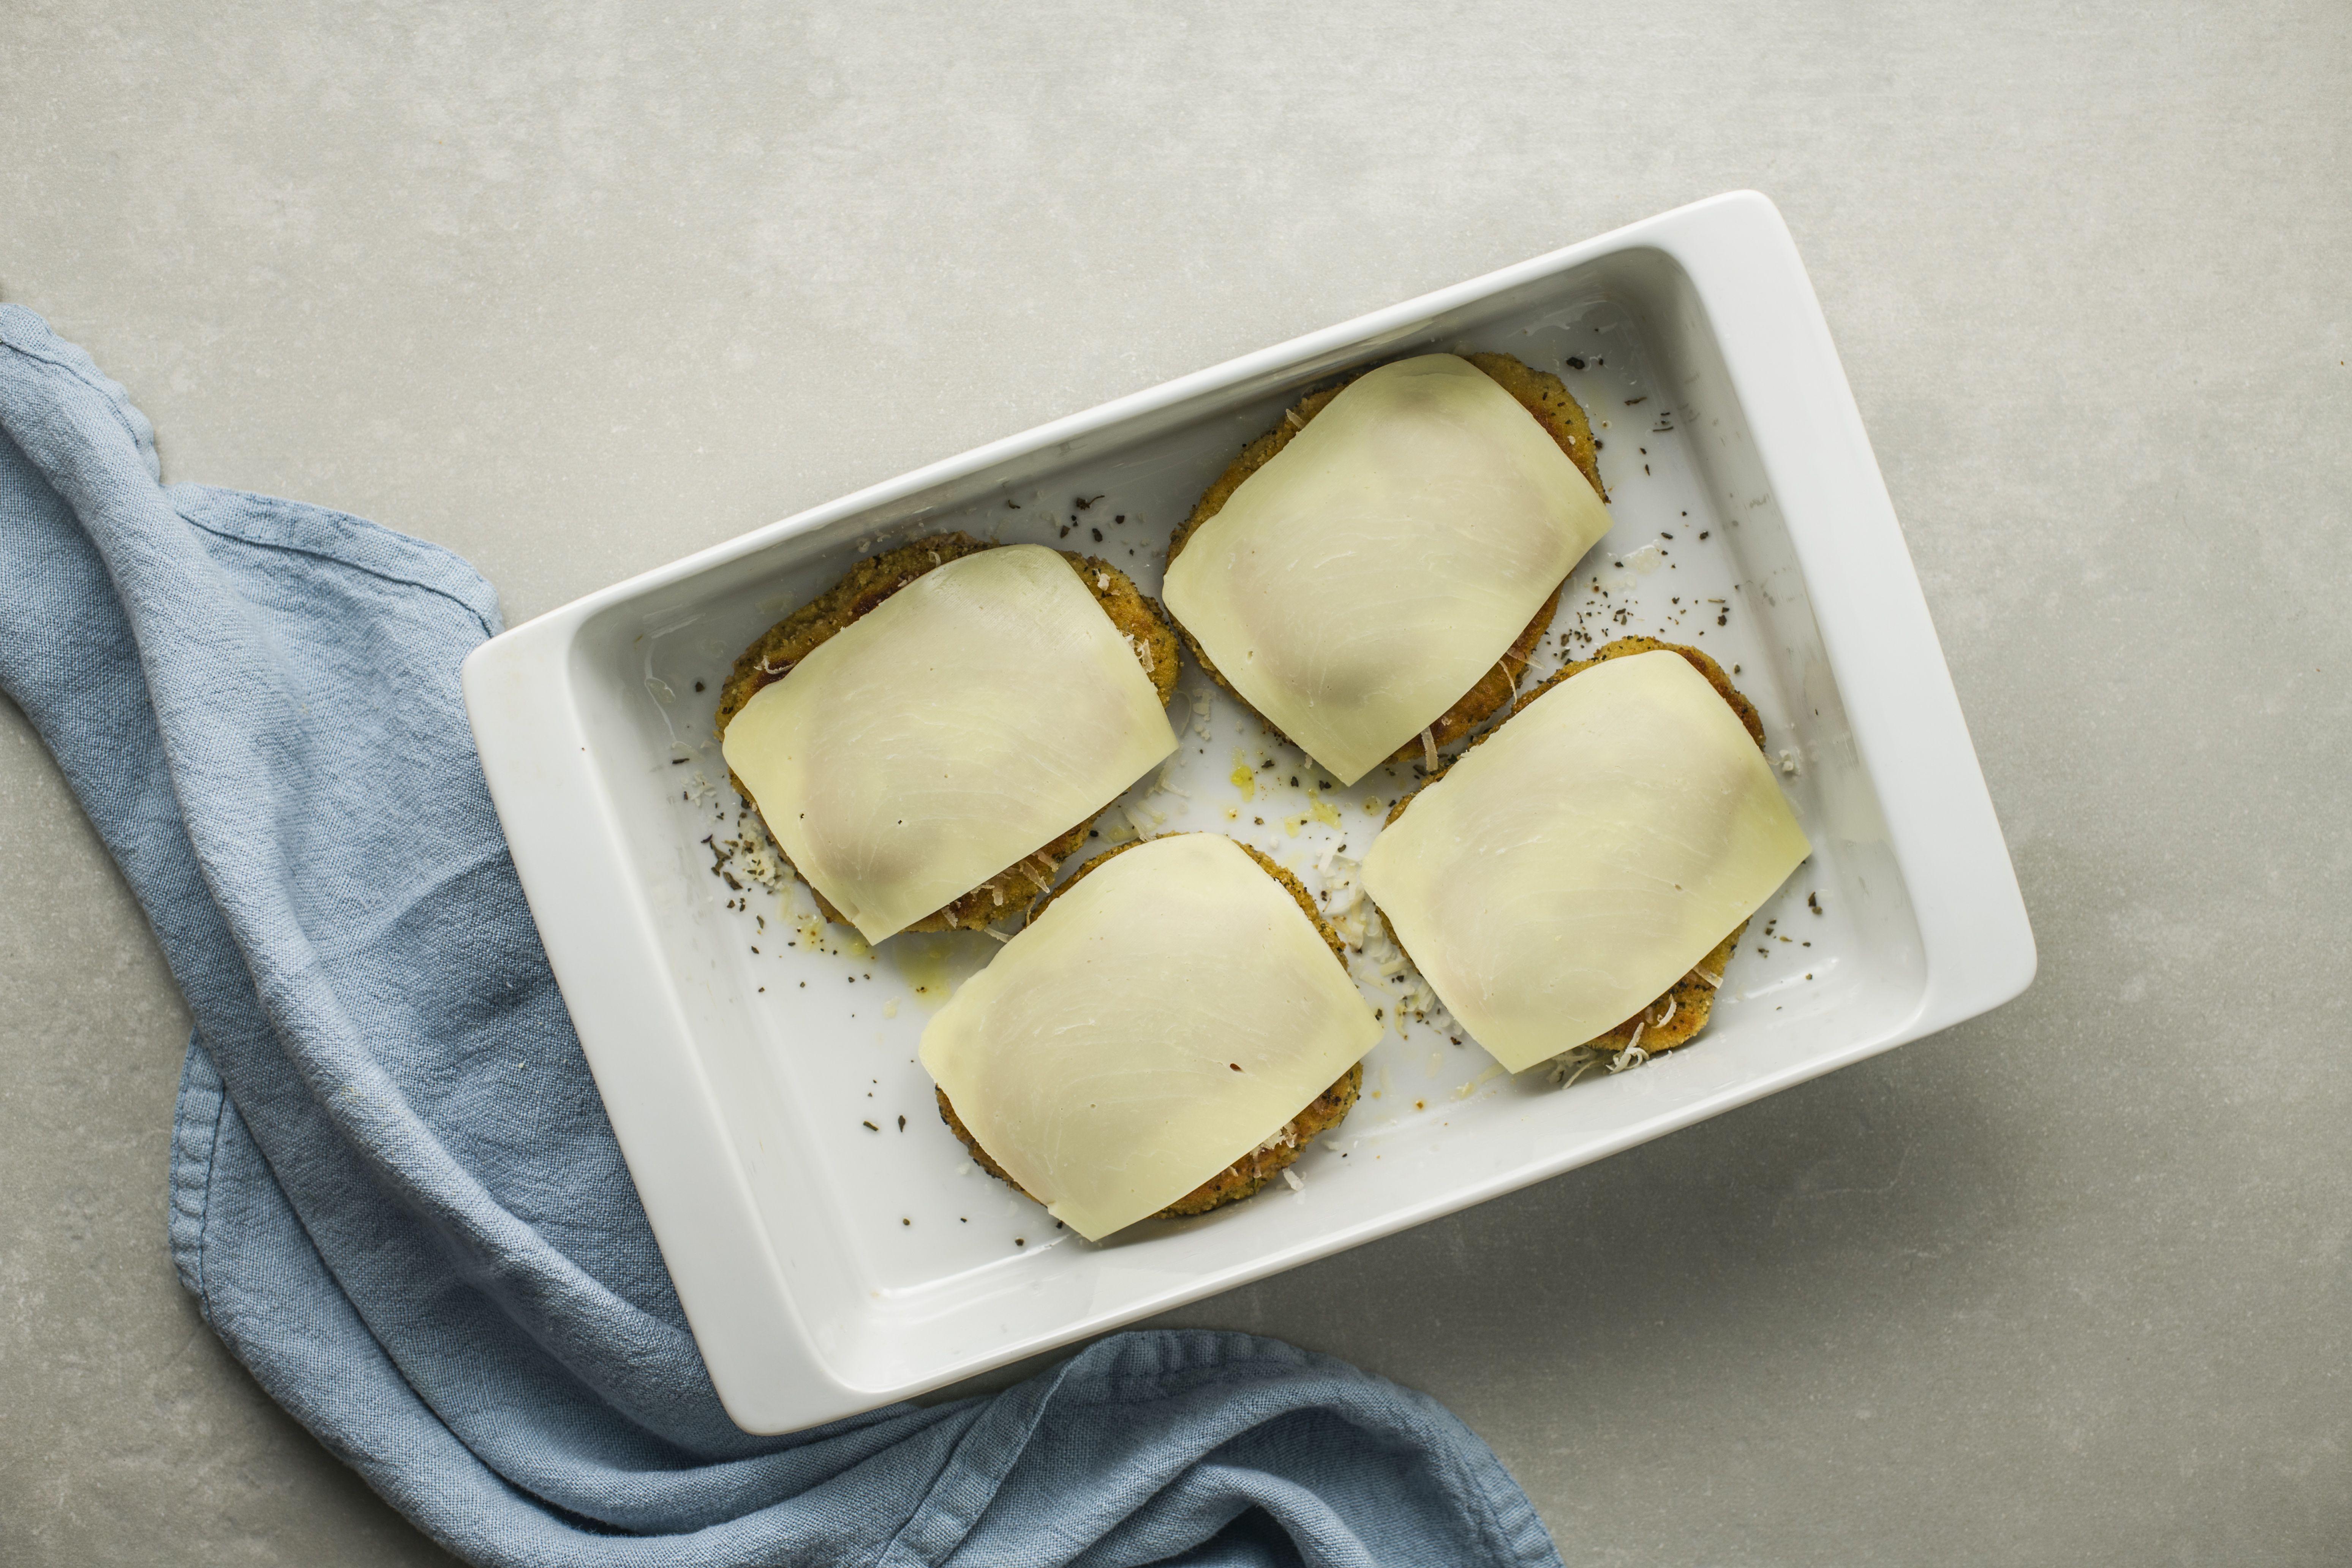 arrange mozzarella over cutlets